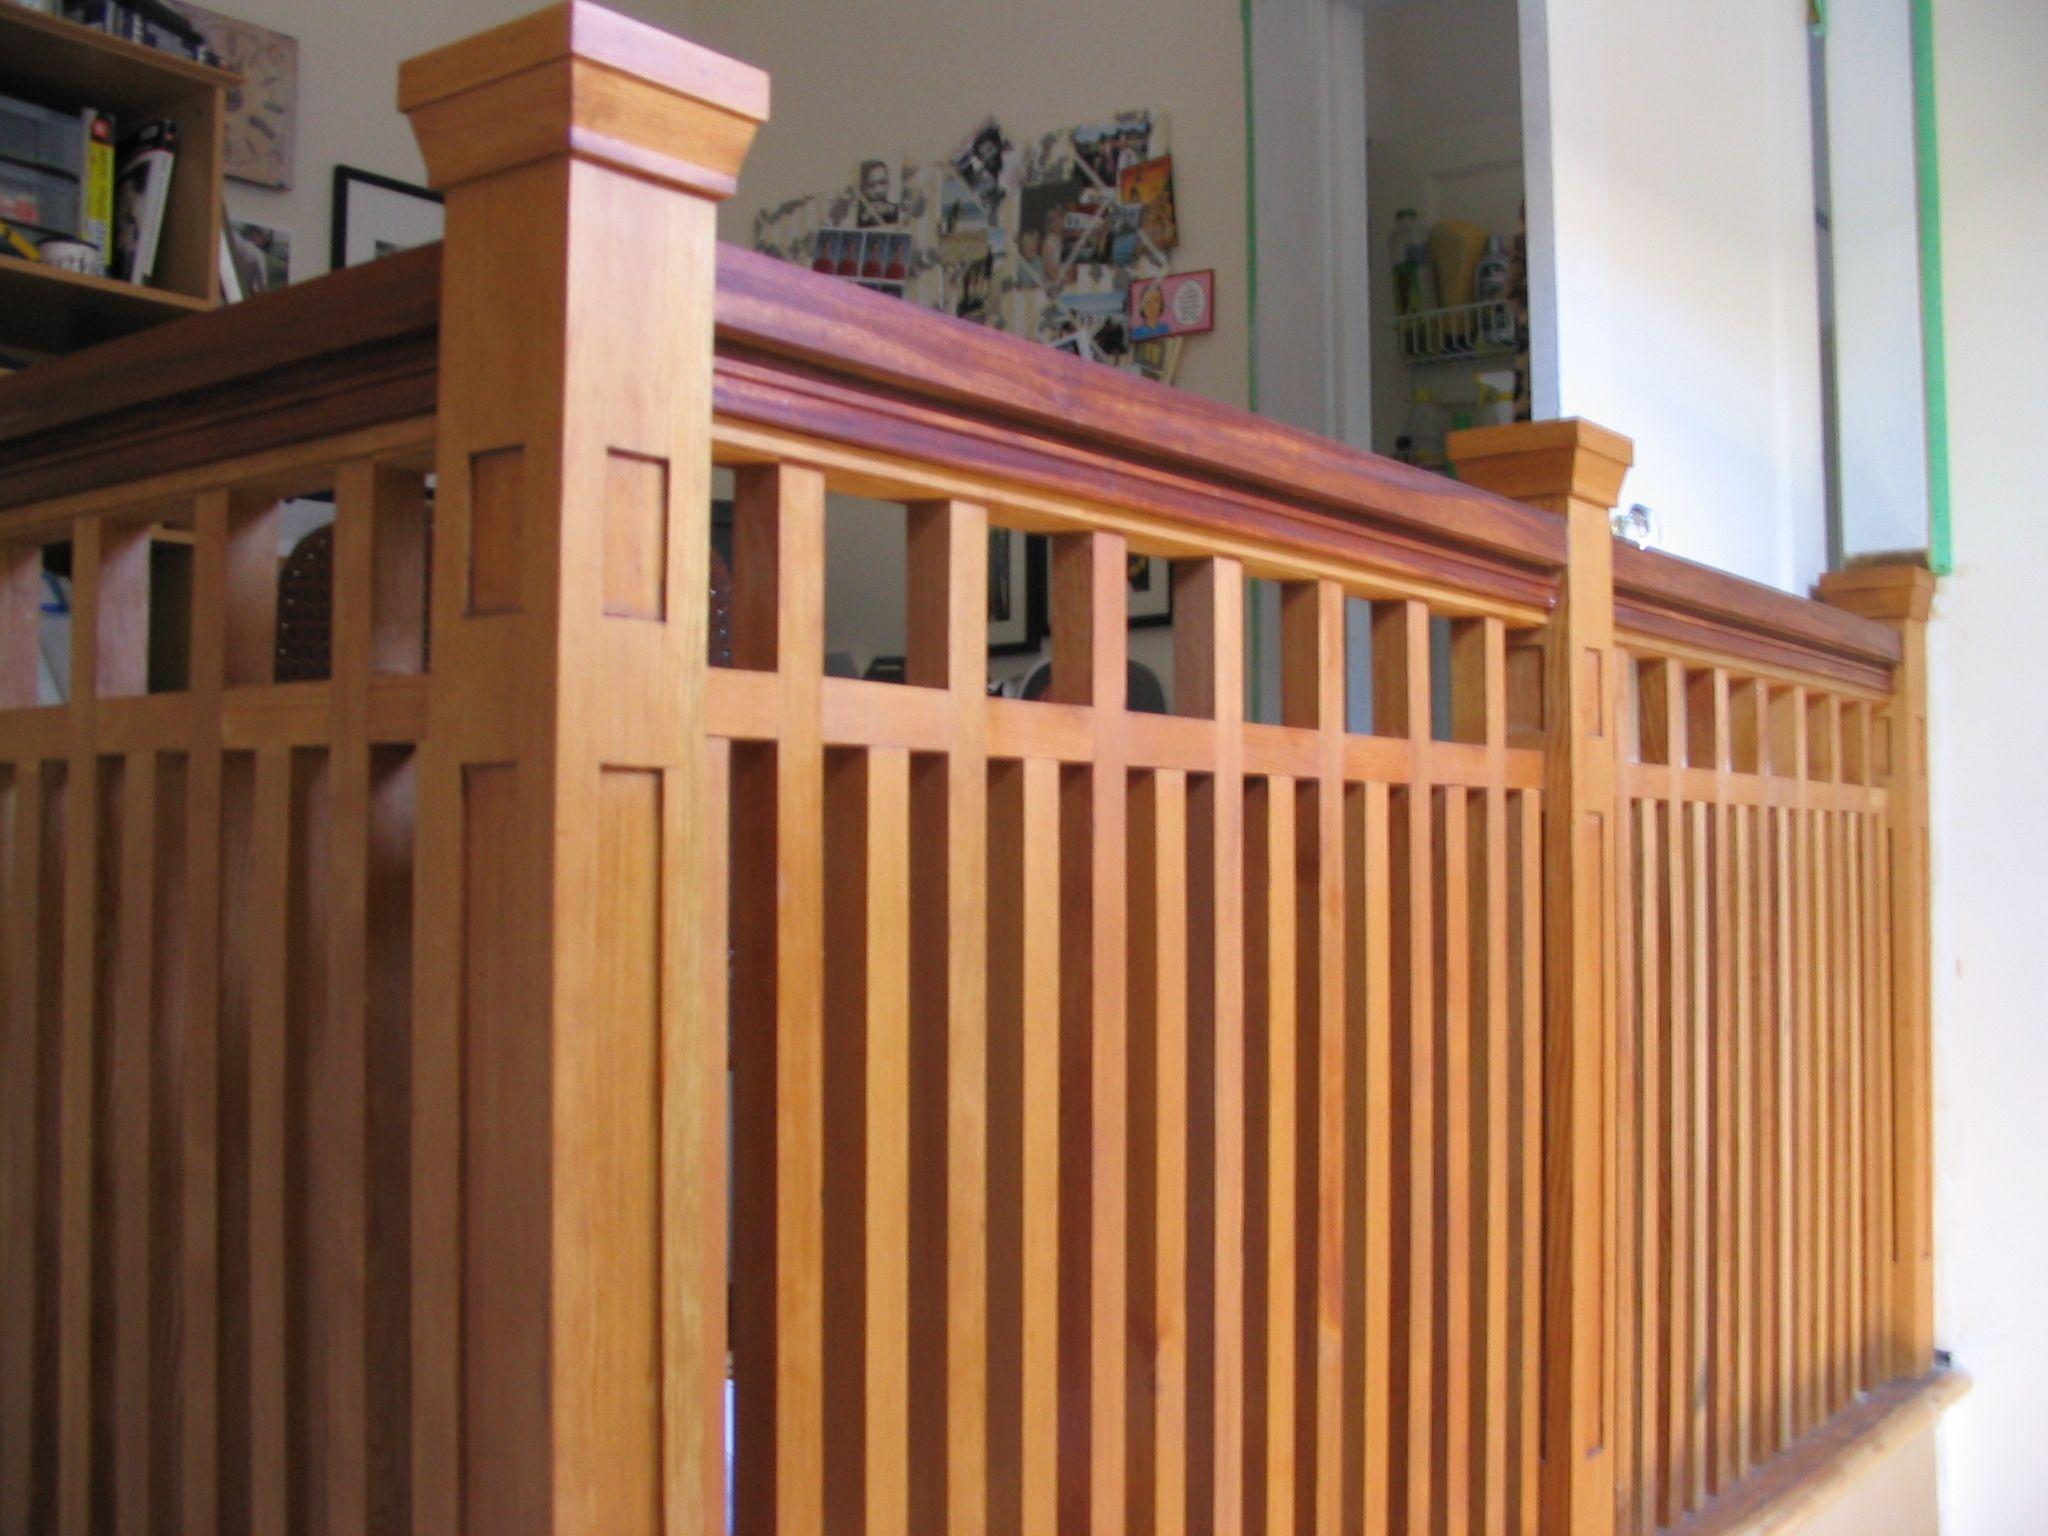 Home design craftsman deck railing designs rustic expansive the home design craftsman deck railing designs rustic expansive the most incredible in addition to stunning baanklon Choice Image